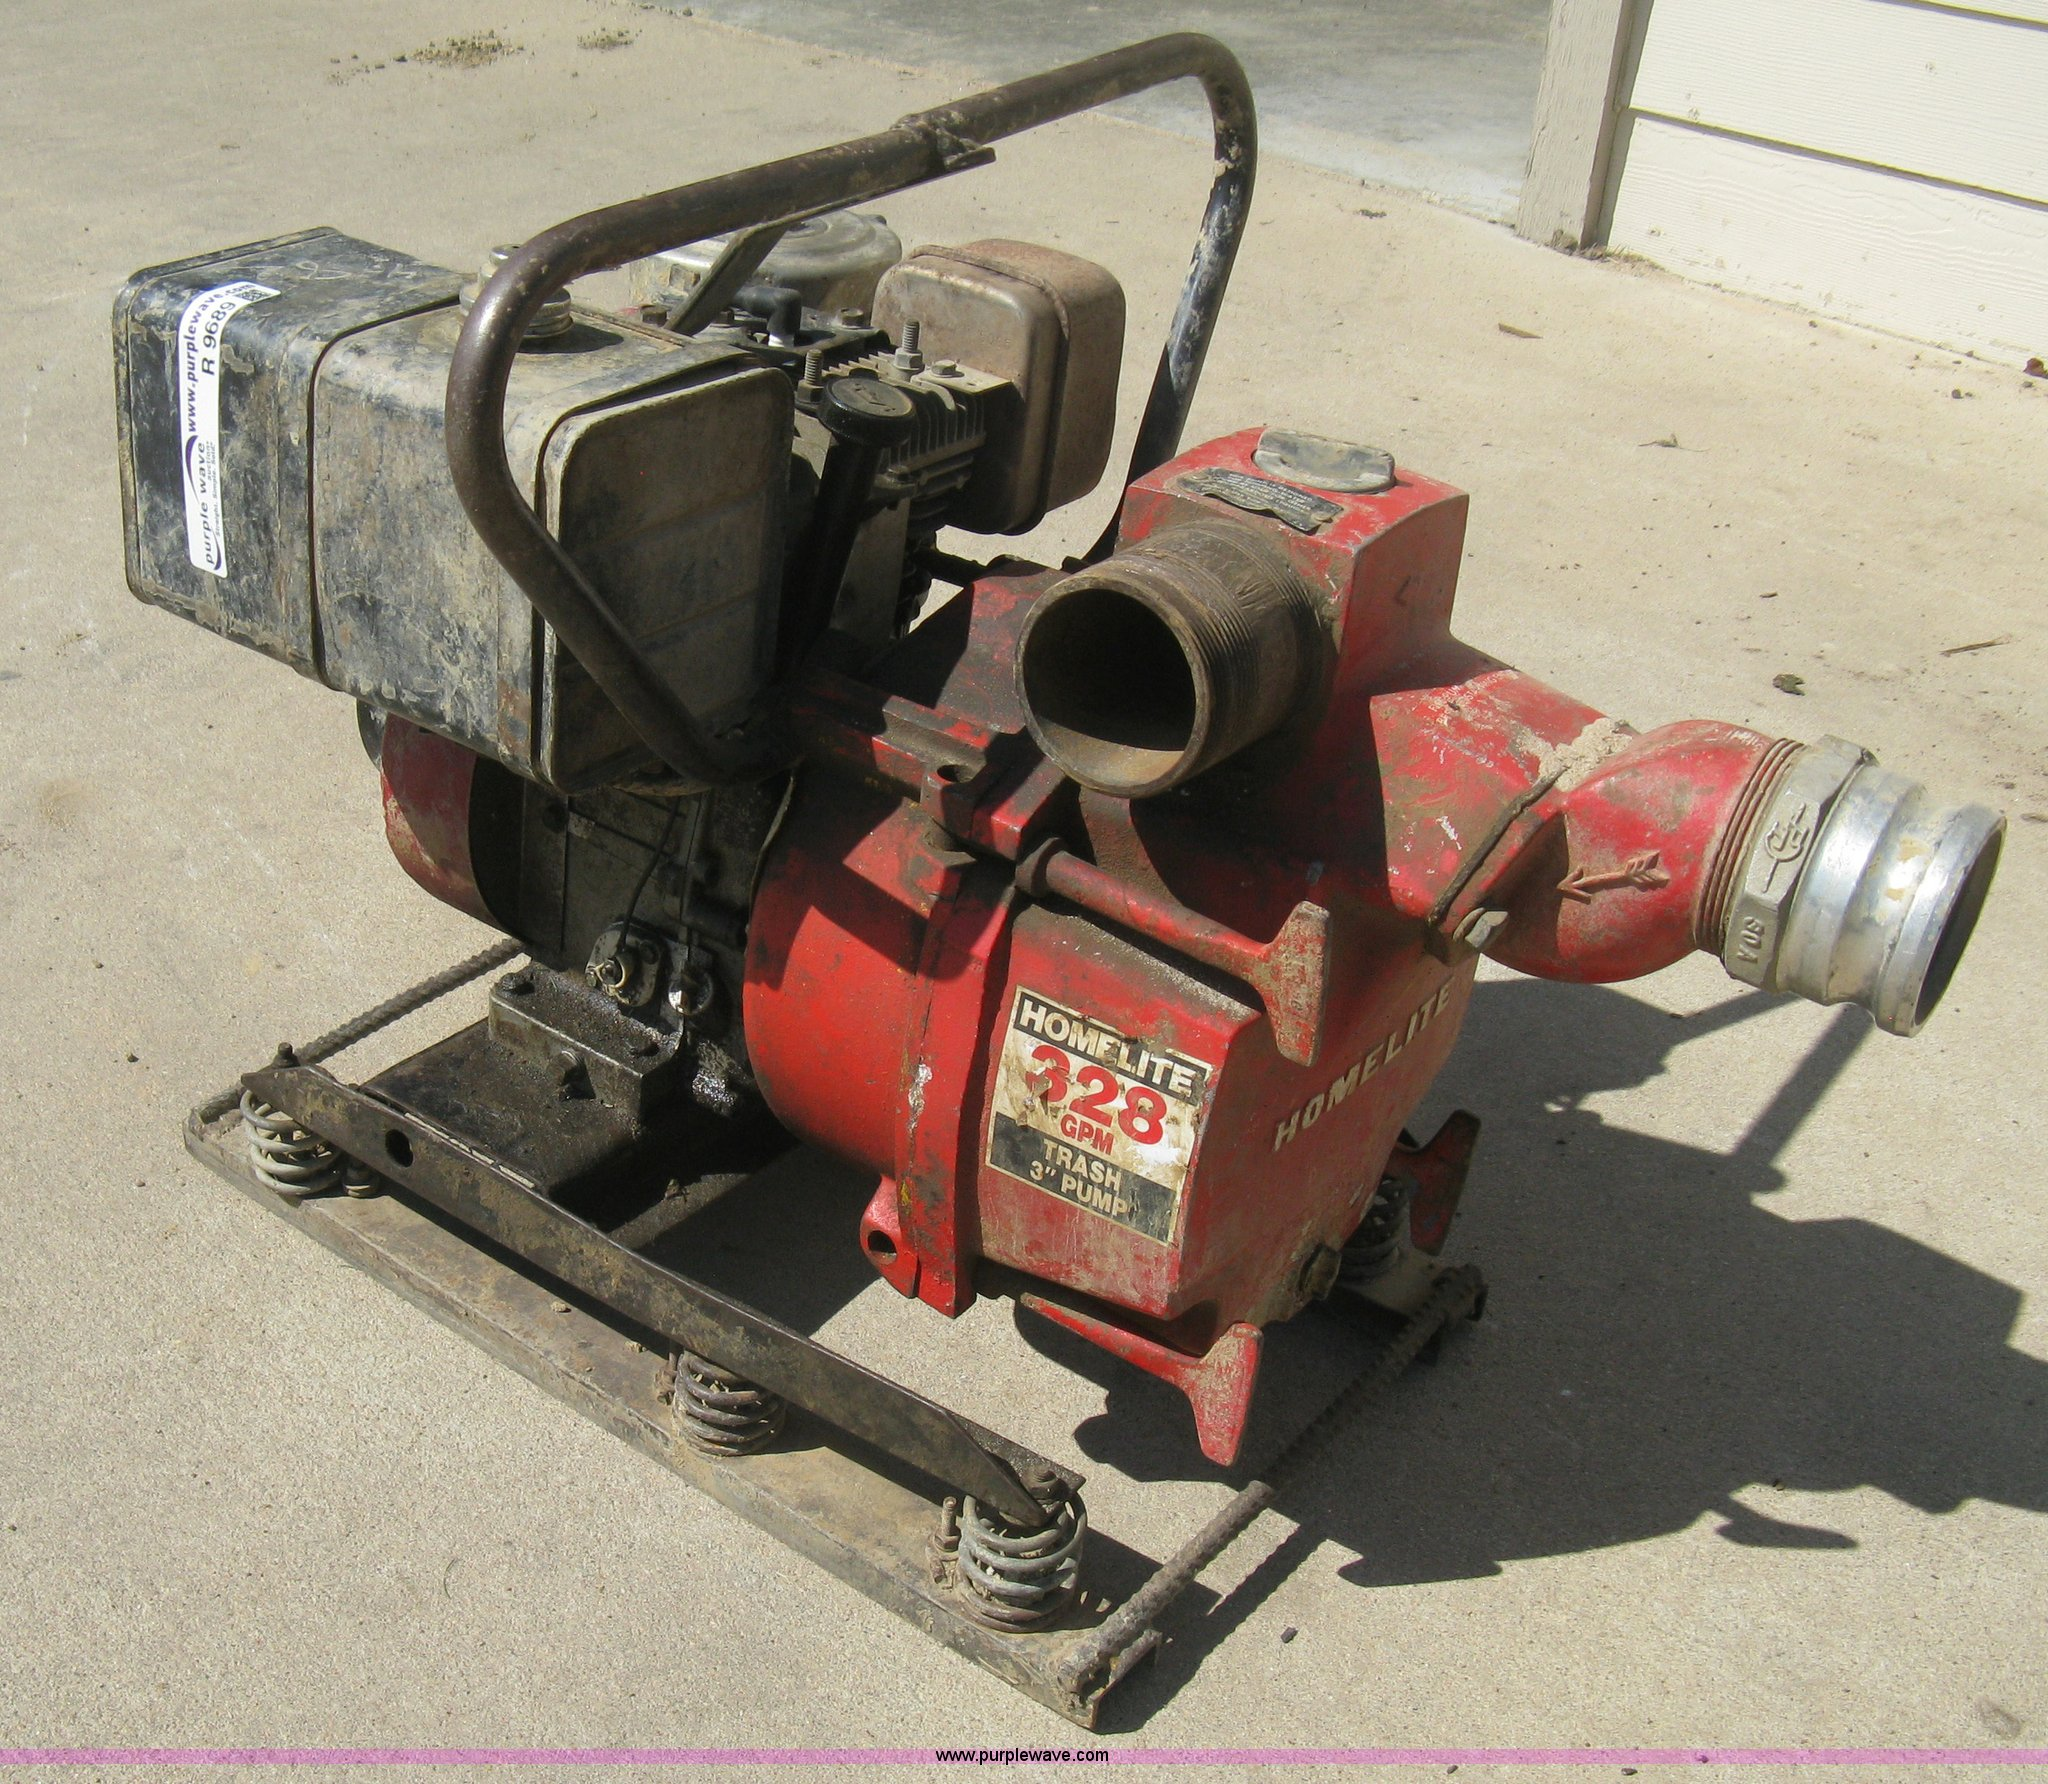 Lot 166 Of 216 Home Lite 610 Trash Pump